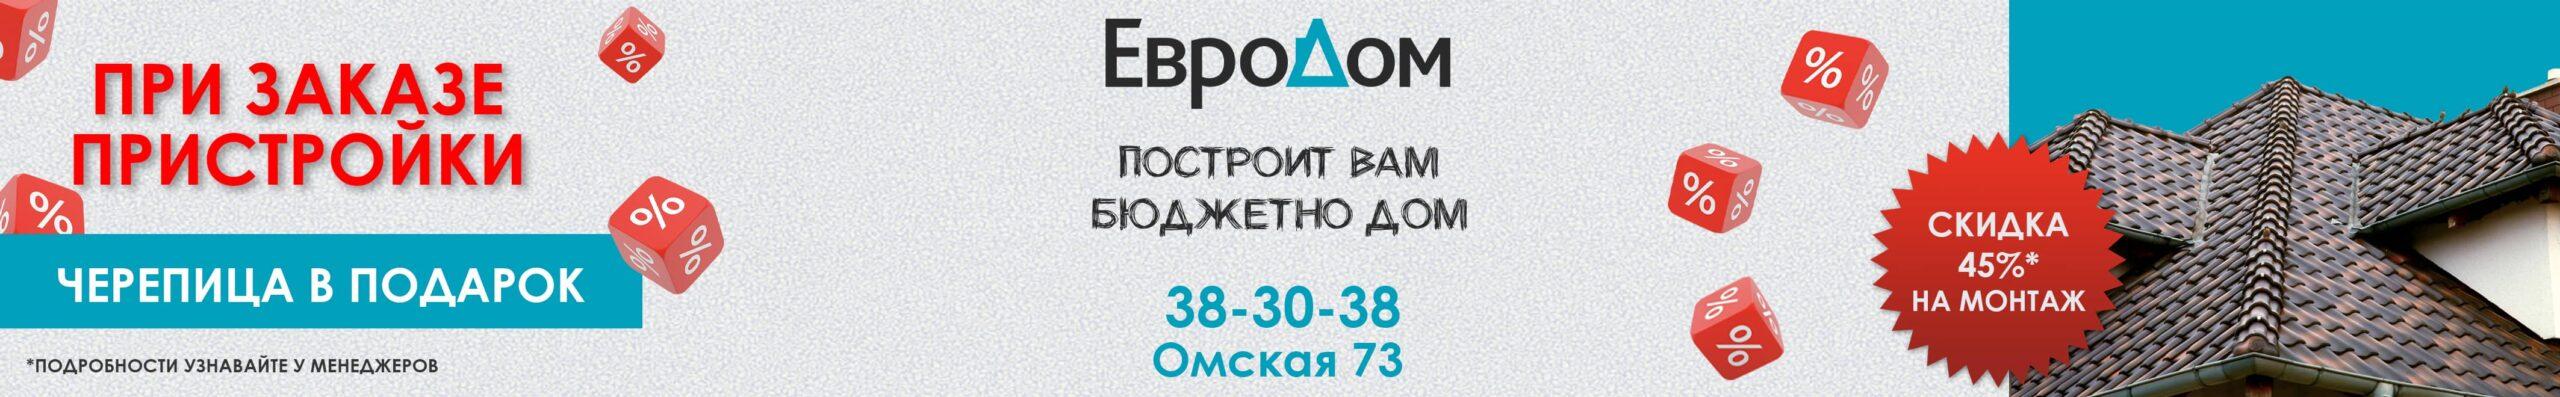 БАНЕР03-min